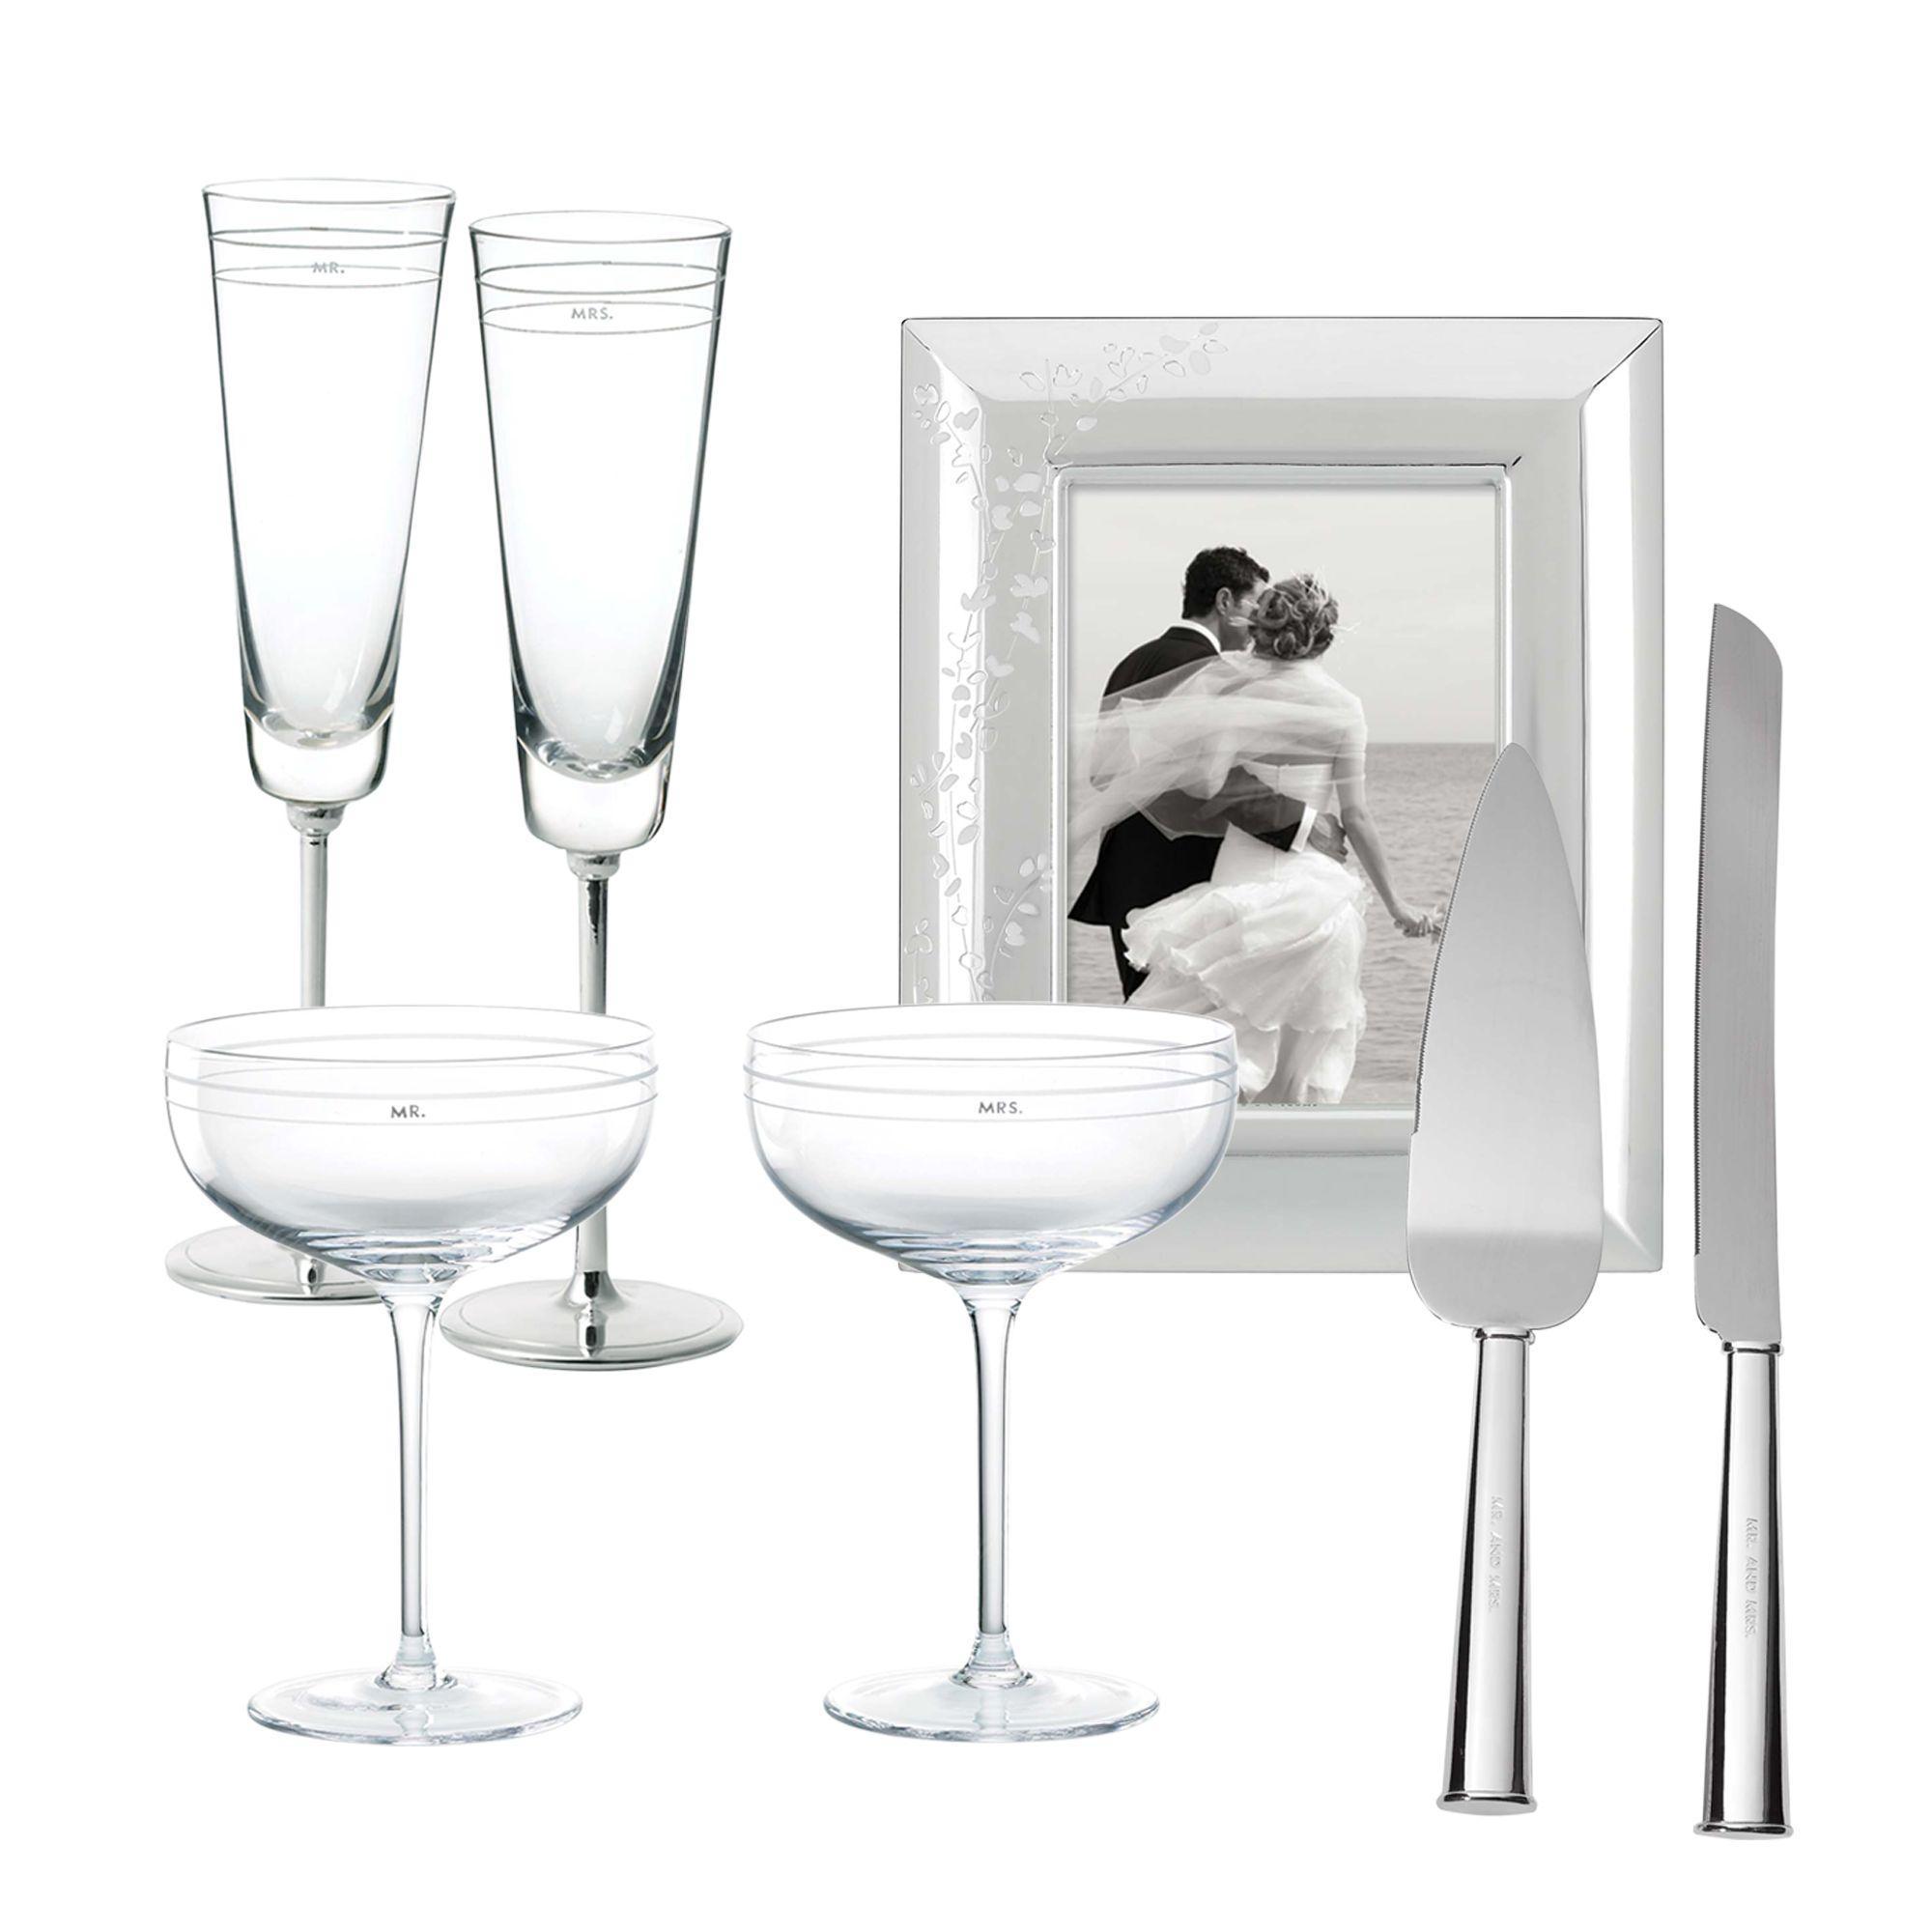 Kate Spade Wedding Gift Ideas : Buy kate spade new york Darling Point Wedding Gifts Online at ...